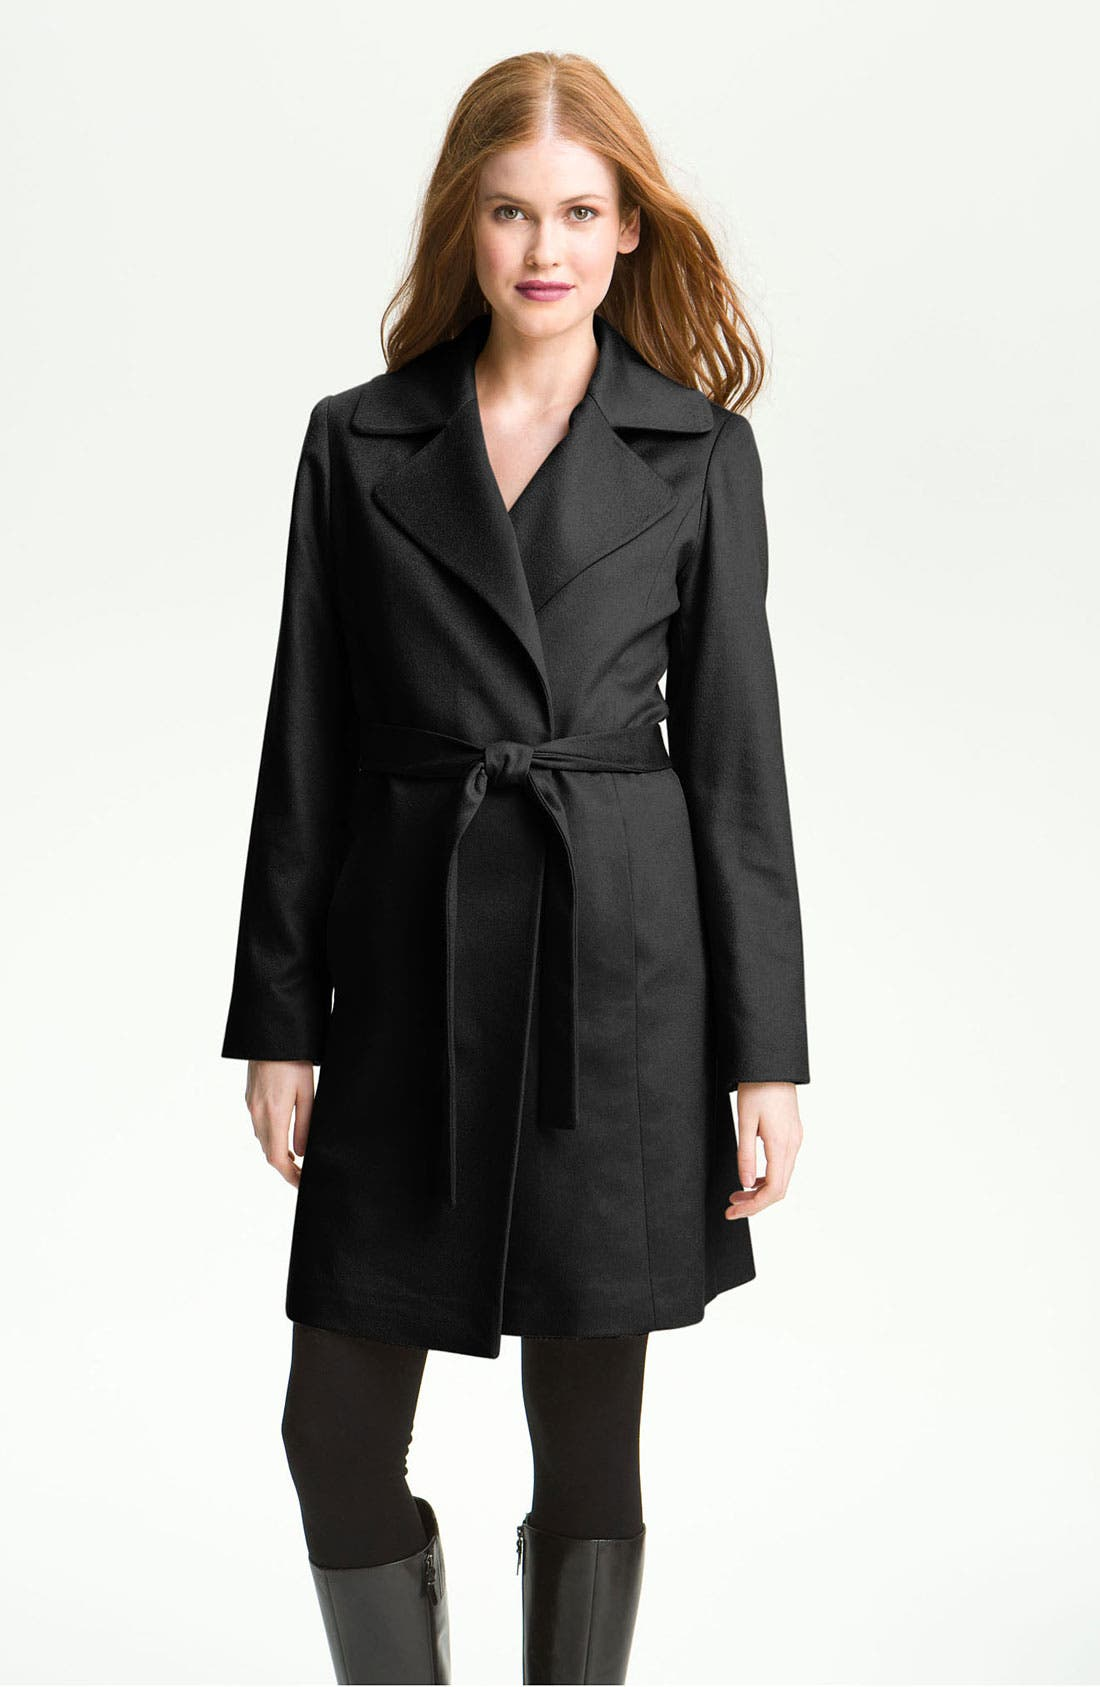 Alternate Image 1 Selected - Fleurette Lightweight Cashmere Wrap Coat (Online Exclusive)